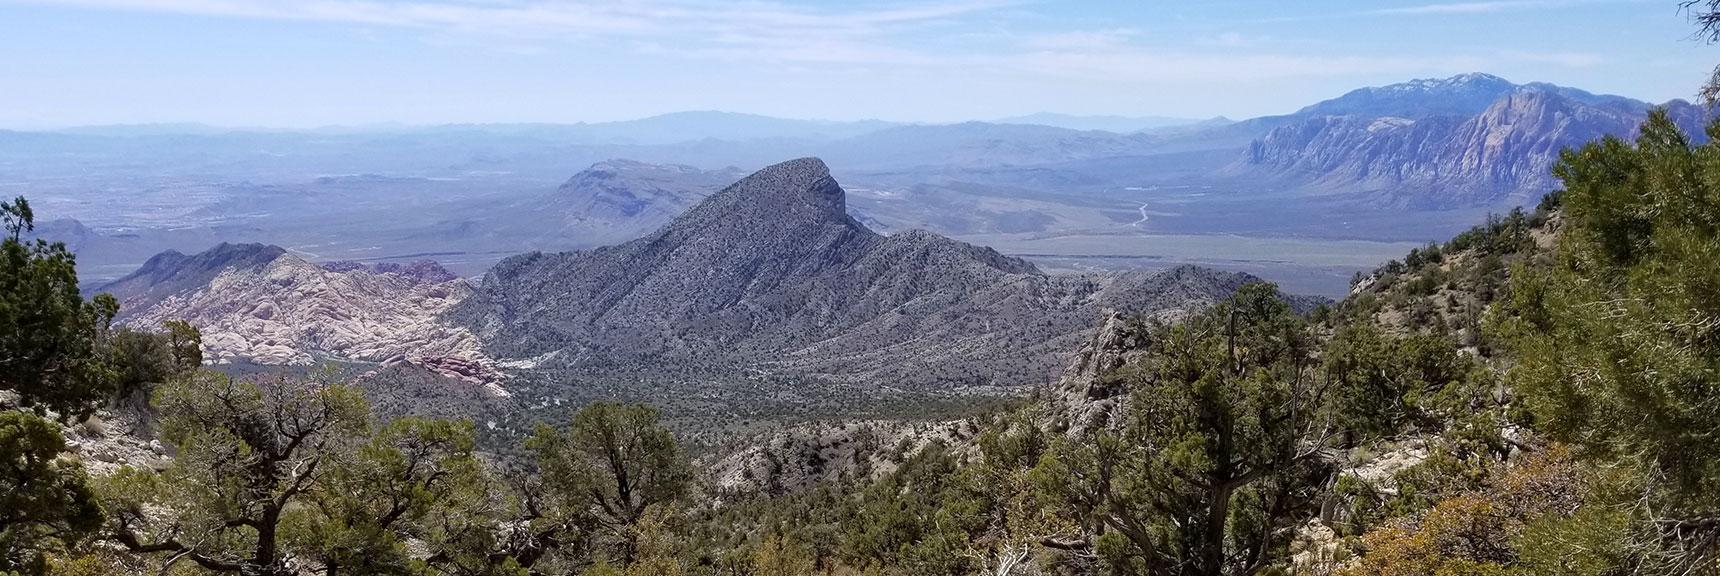 Turtlehead Peak Viewed Down La Madre Summit Pass Route at 7,200ft, Nevada